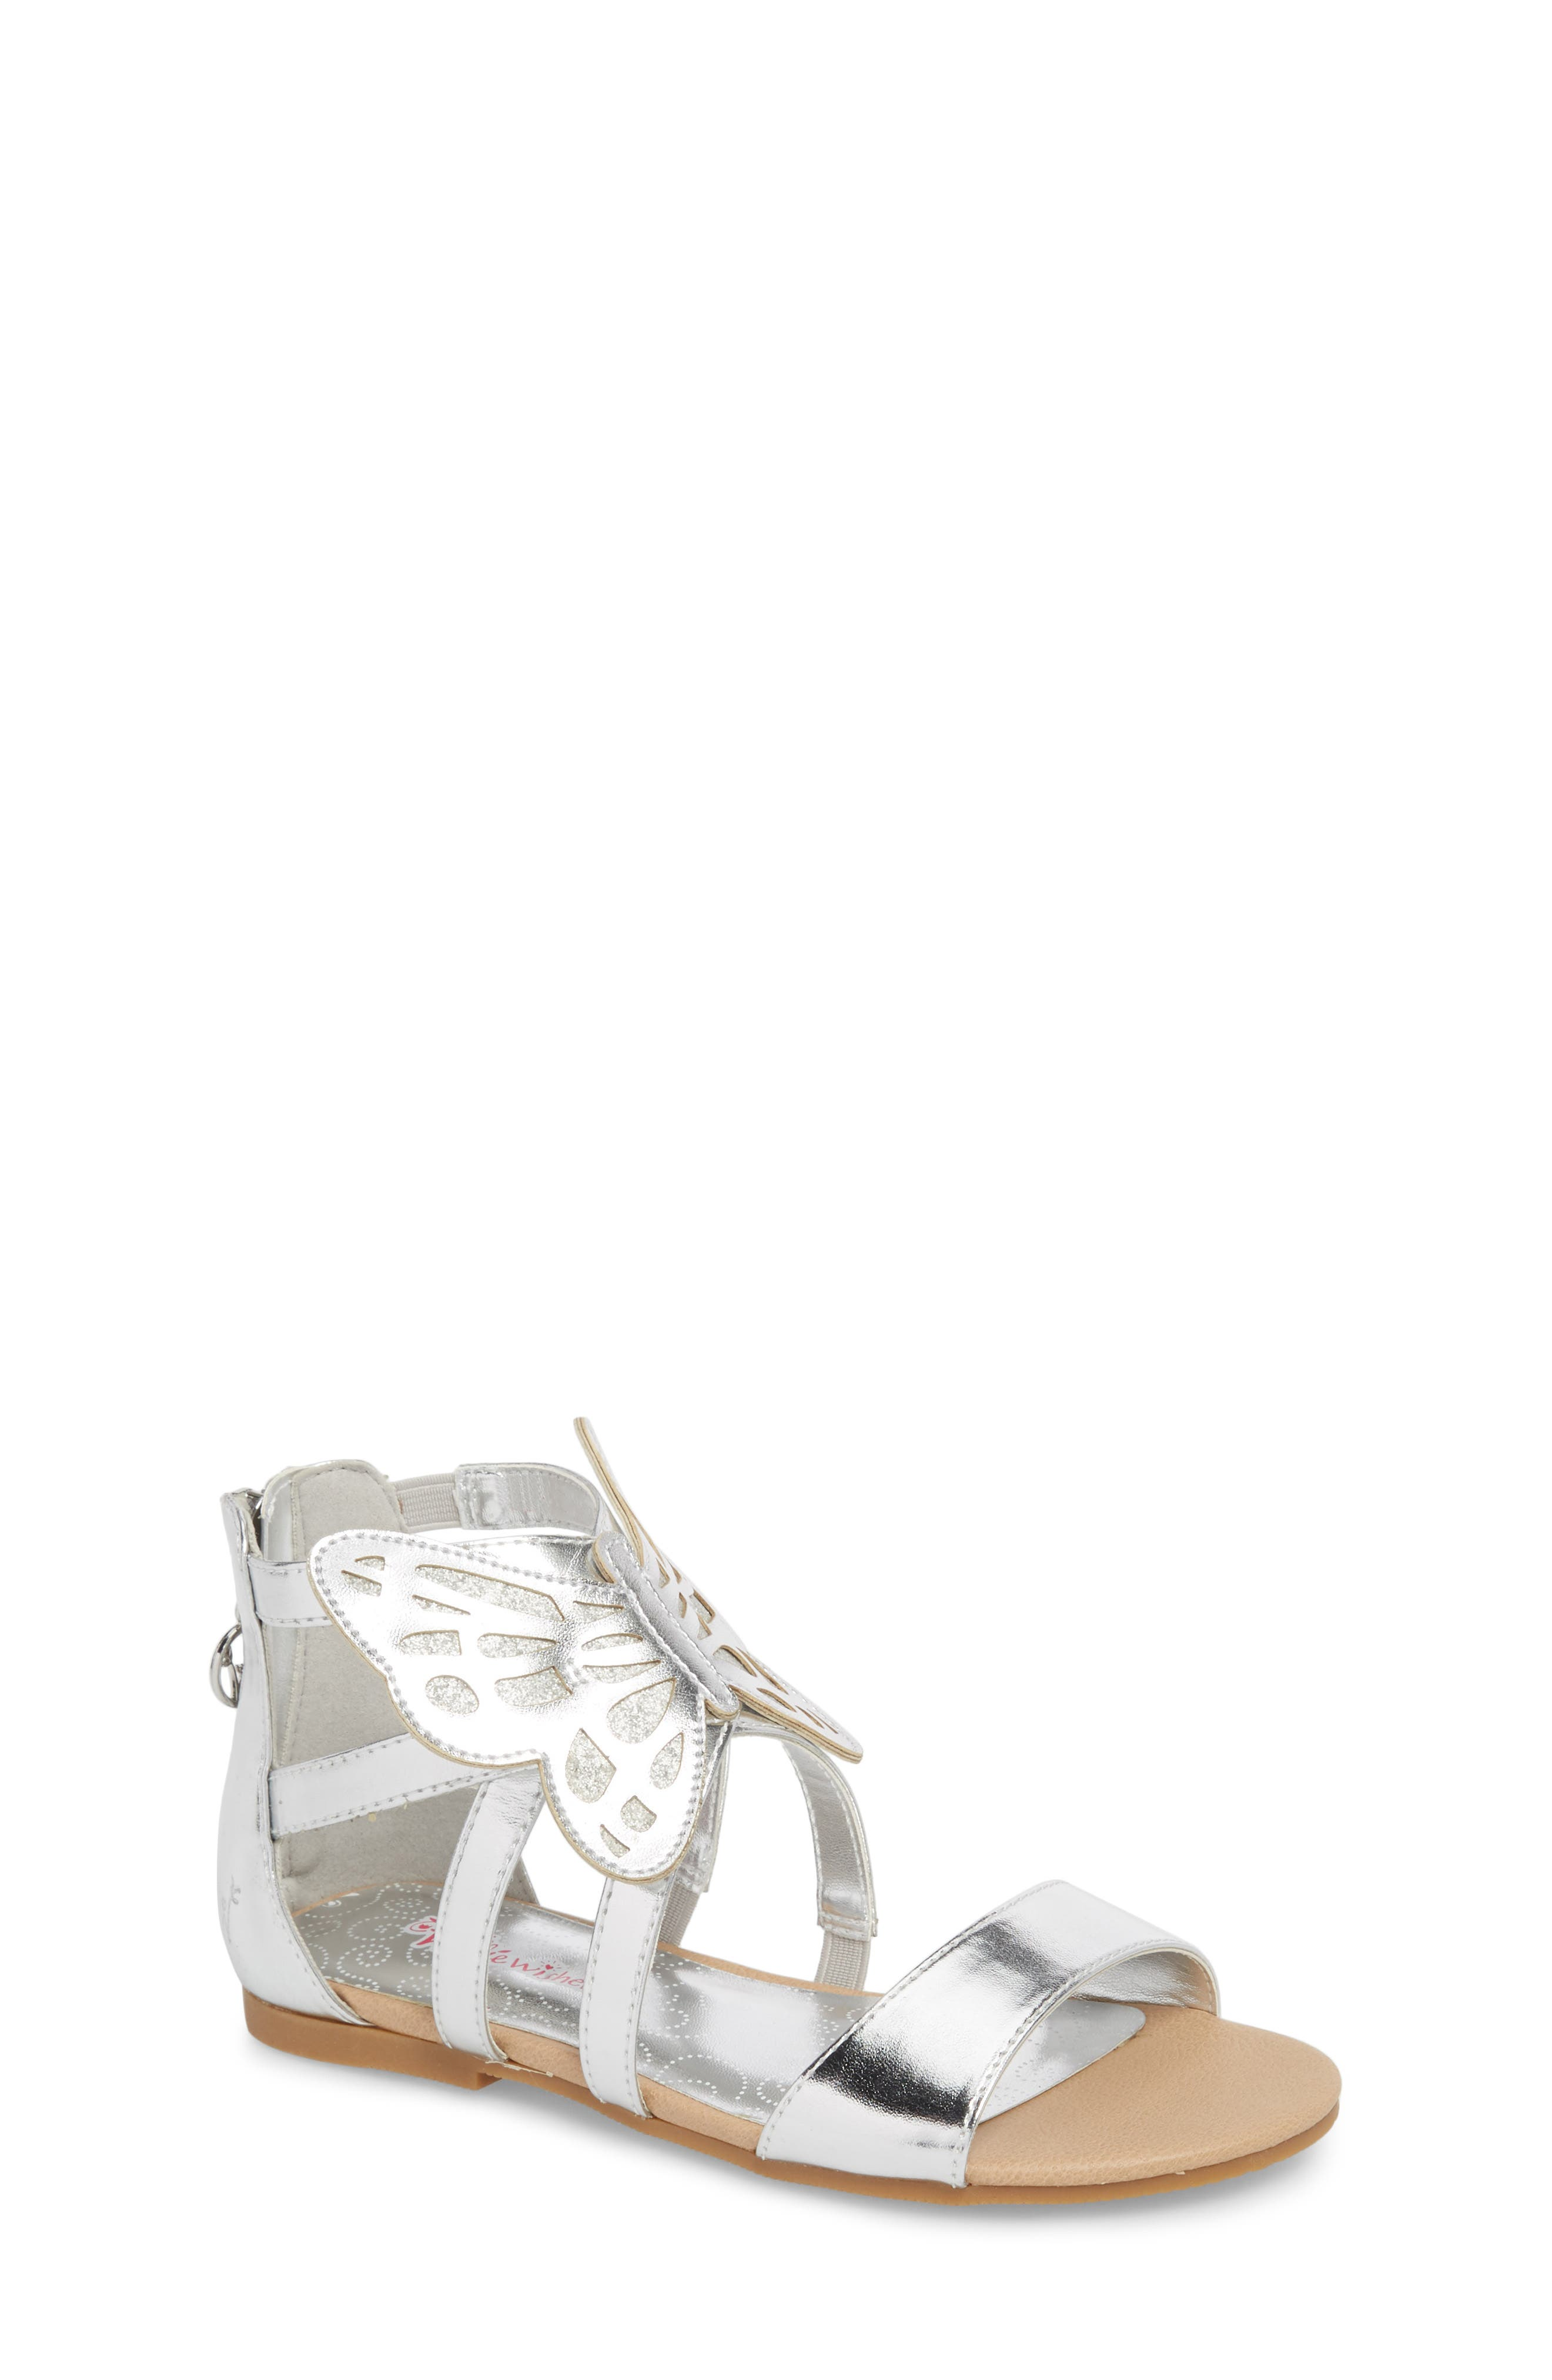 Main Image - WellieWishers from American Girl Willa Flutter Metallic Sandal (Walker, Toddler & Little Kid)